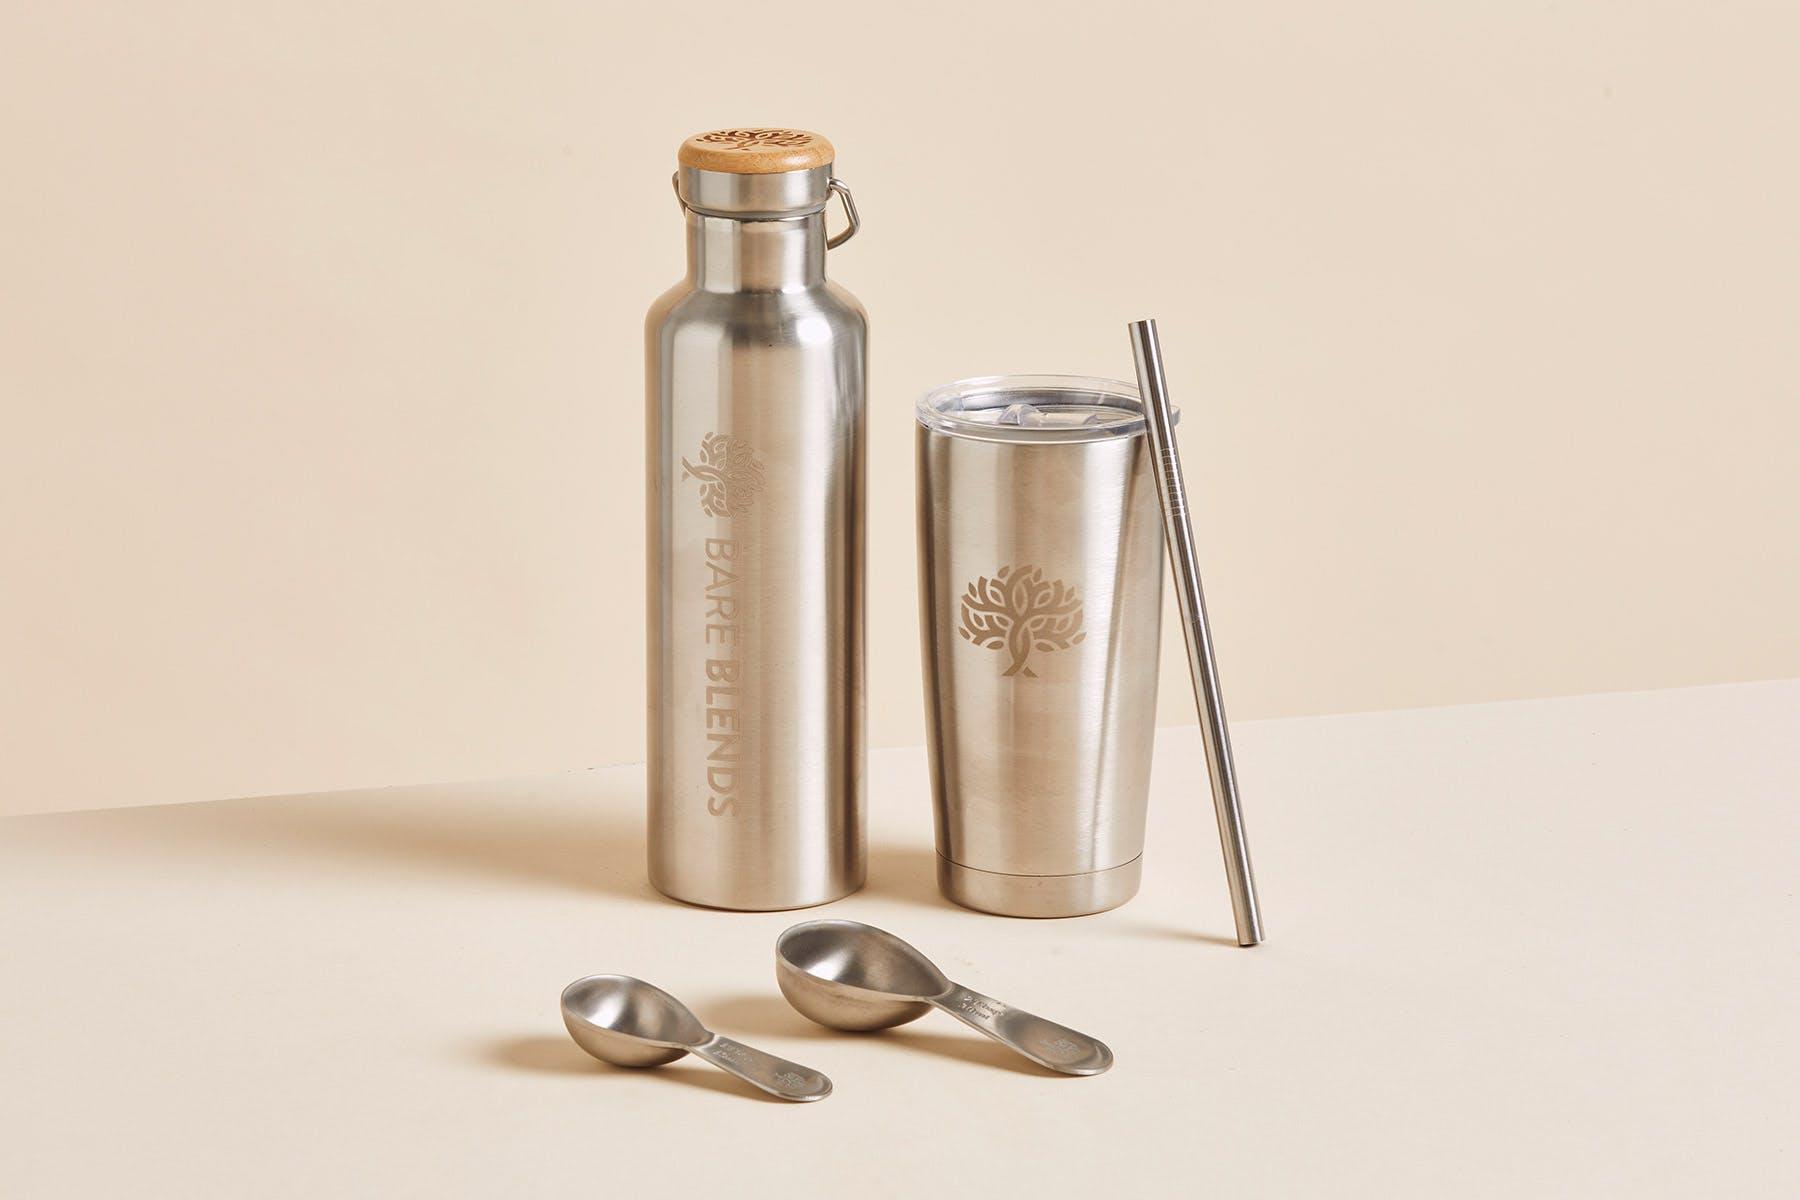 Eco-friendly accessories